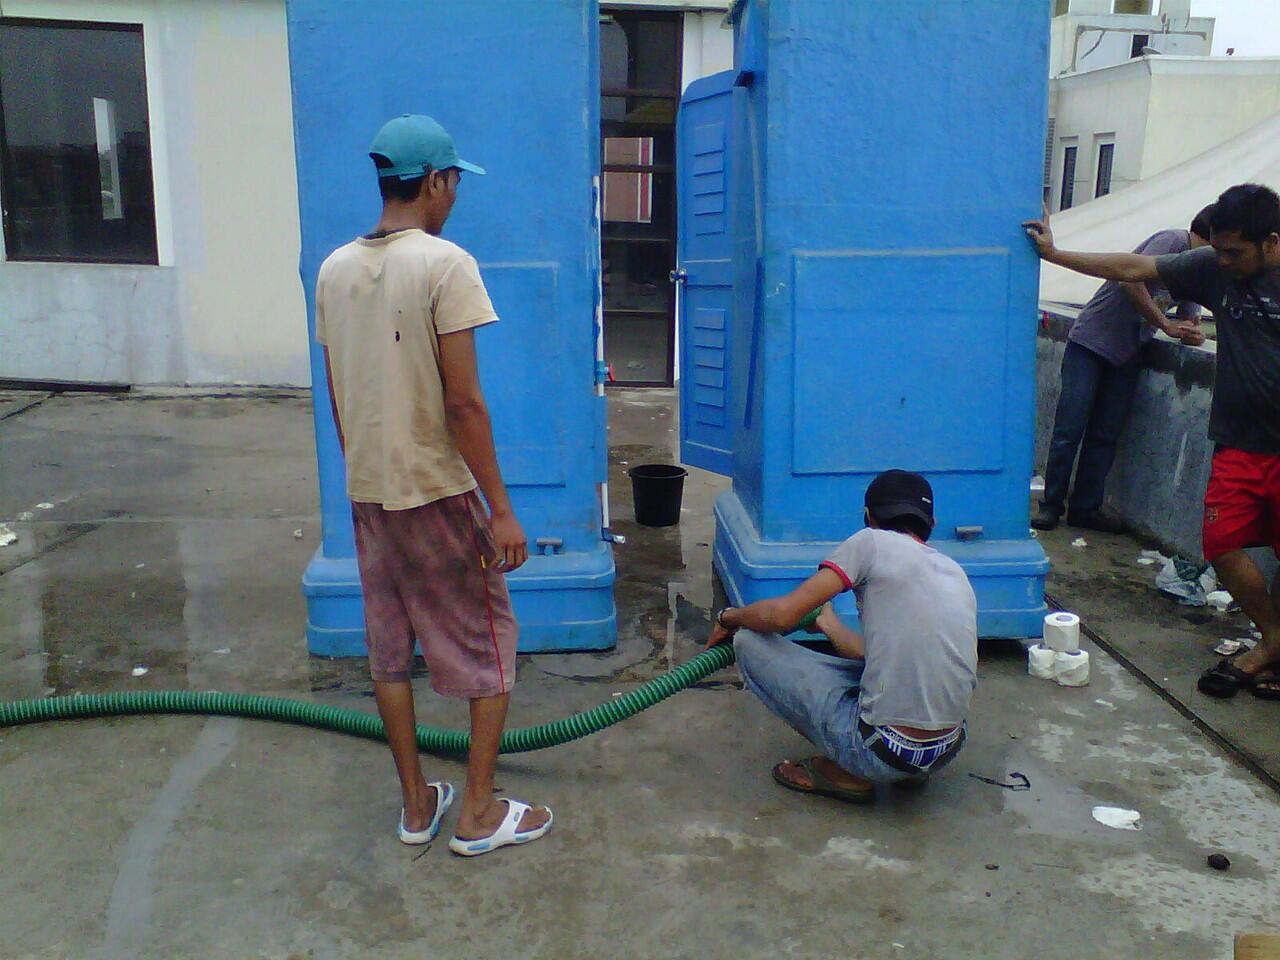 Jual toilet portable murah,produsen toilet portable modern Biolast,Sewa toilet